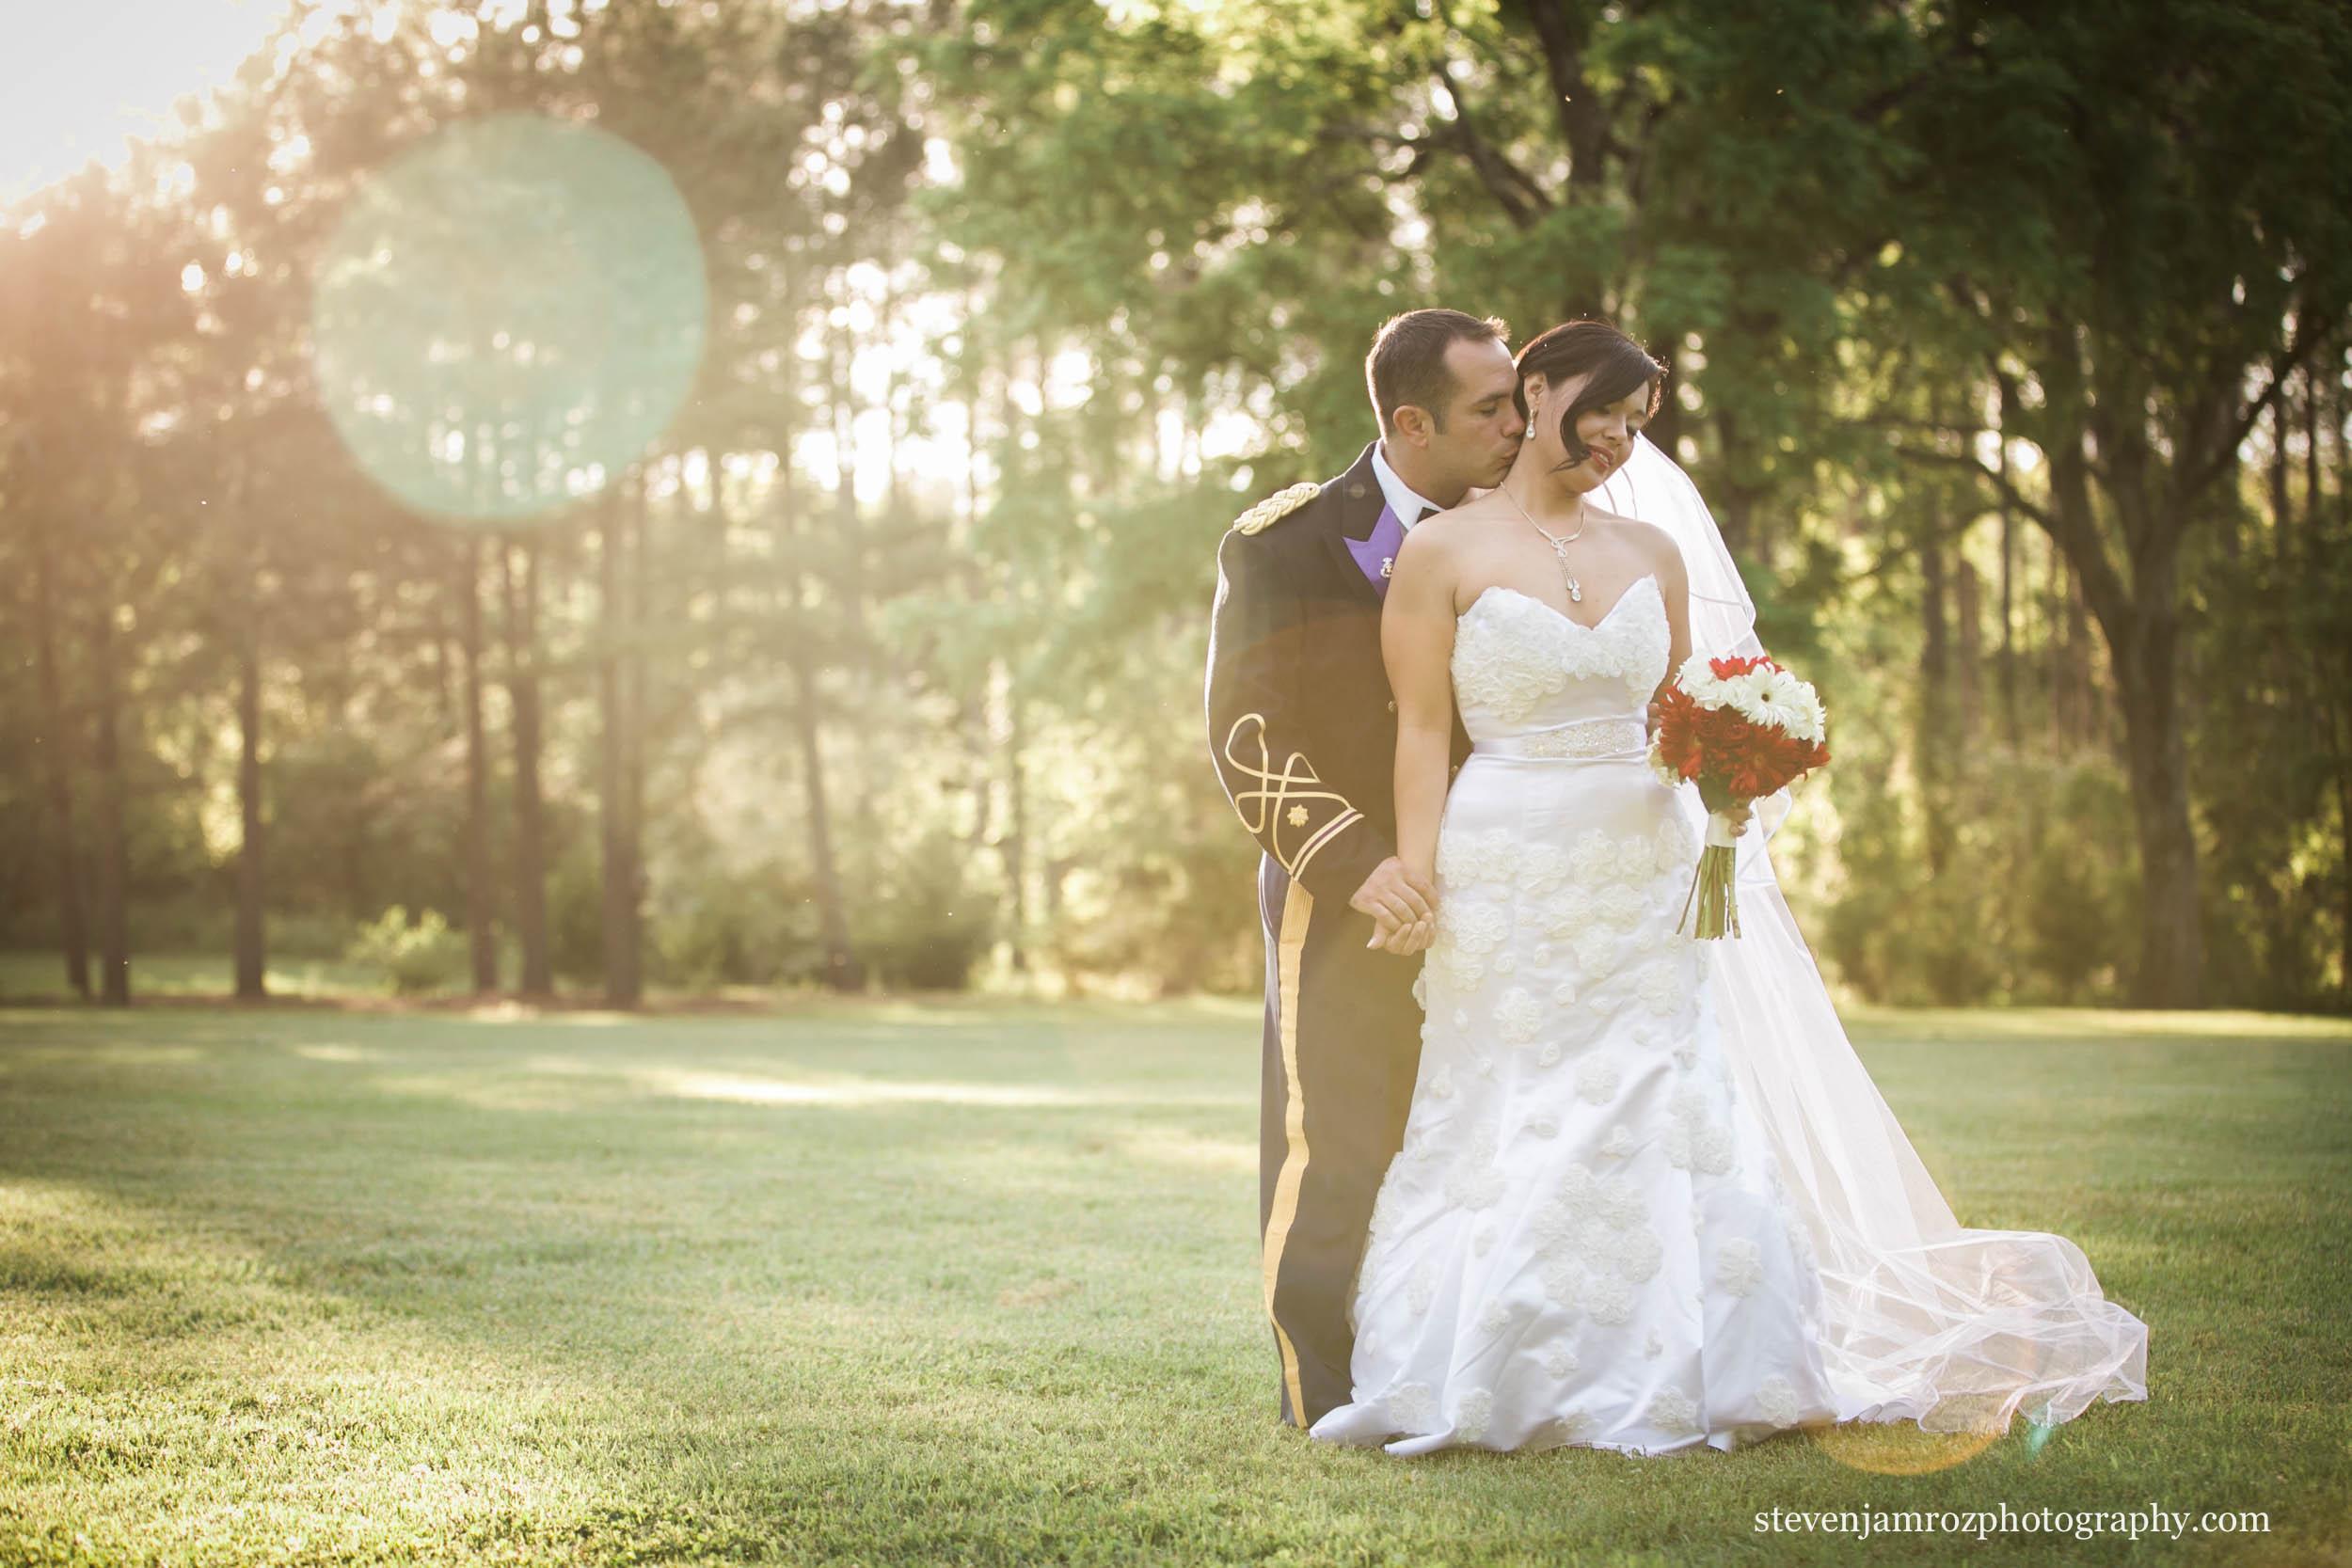 afternoon-bride-groom-wedding-nc-steven-jamroz-photography-0210.jpg